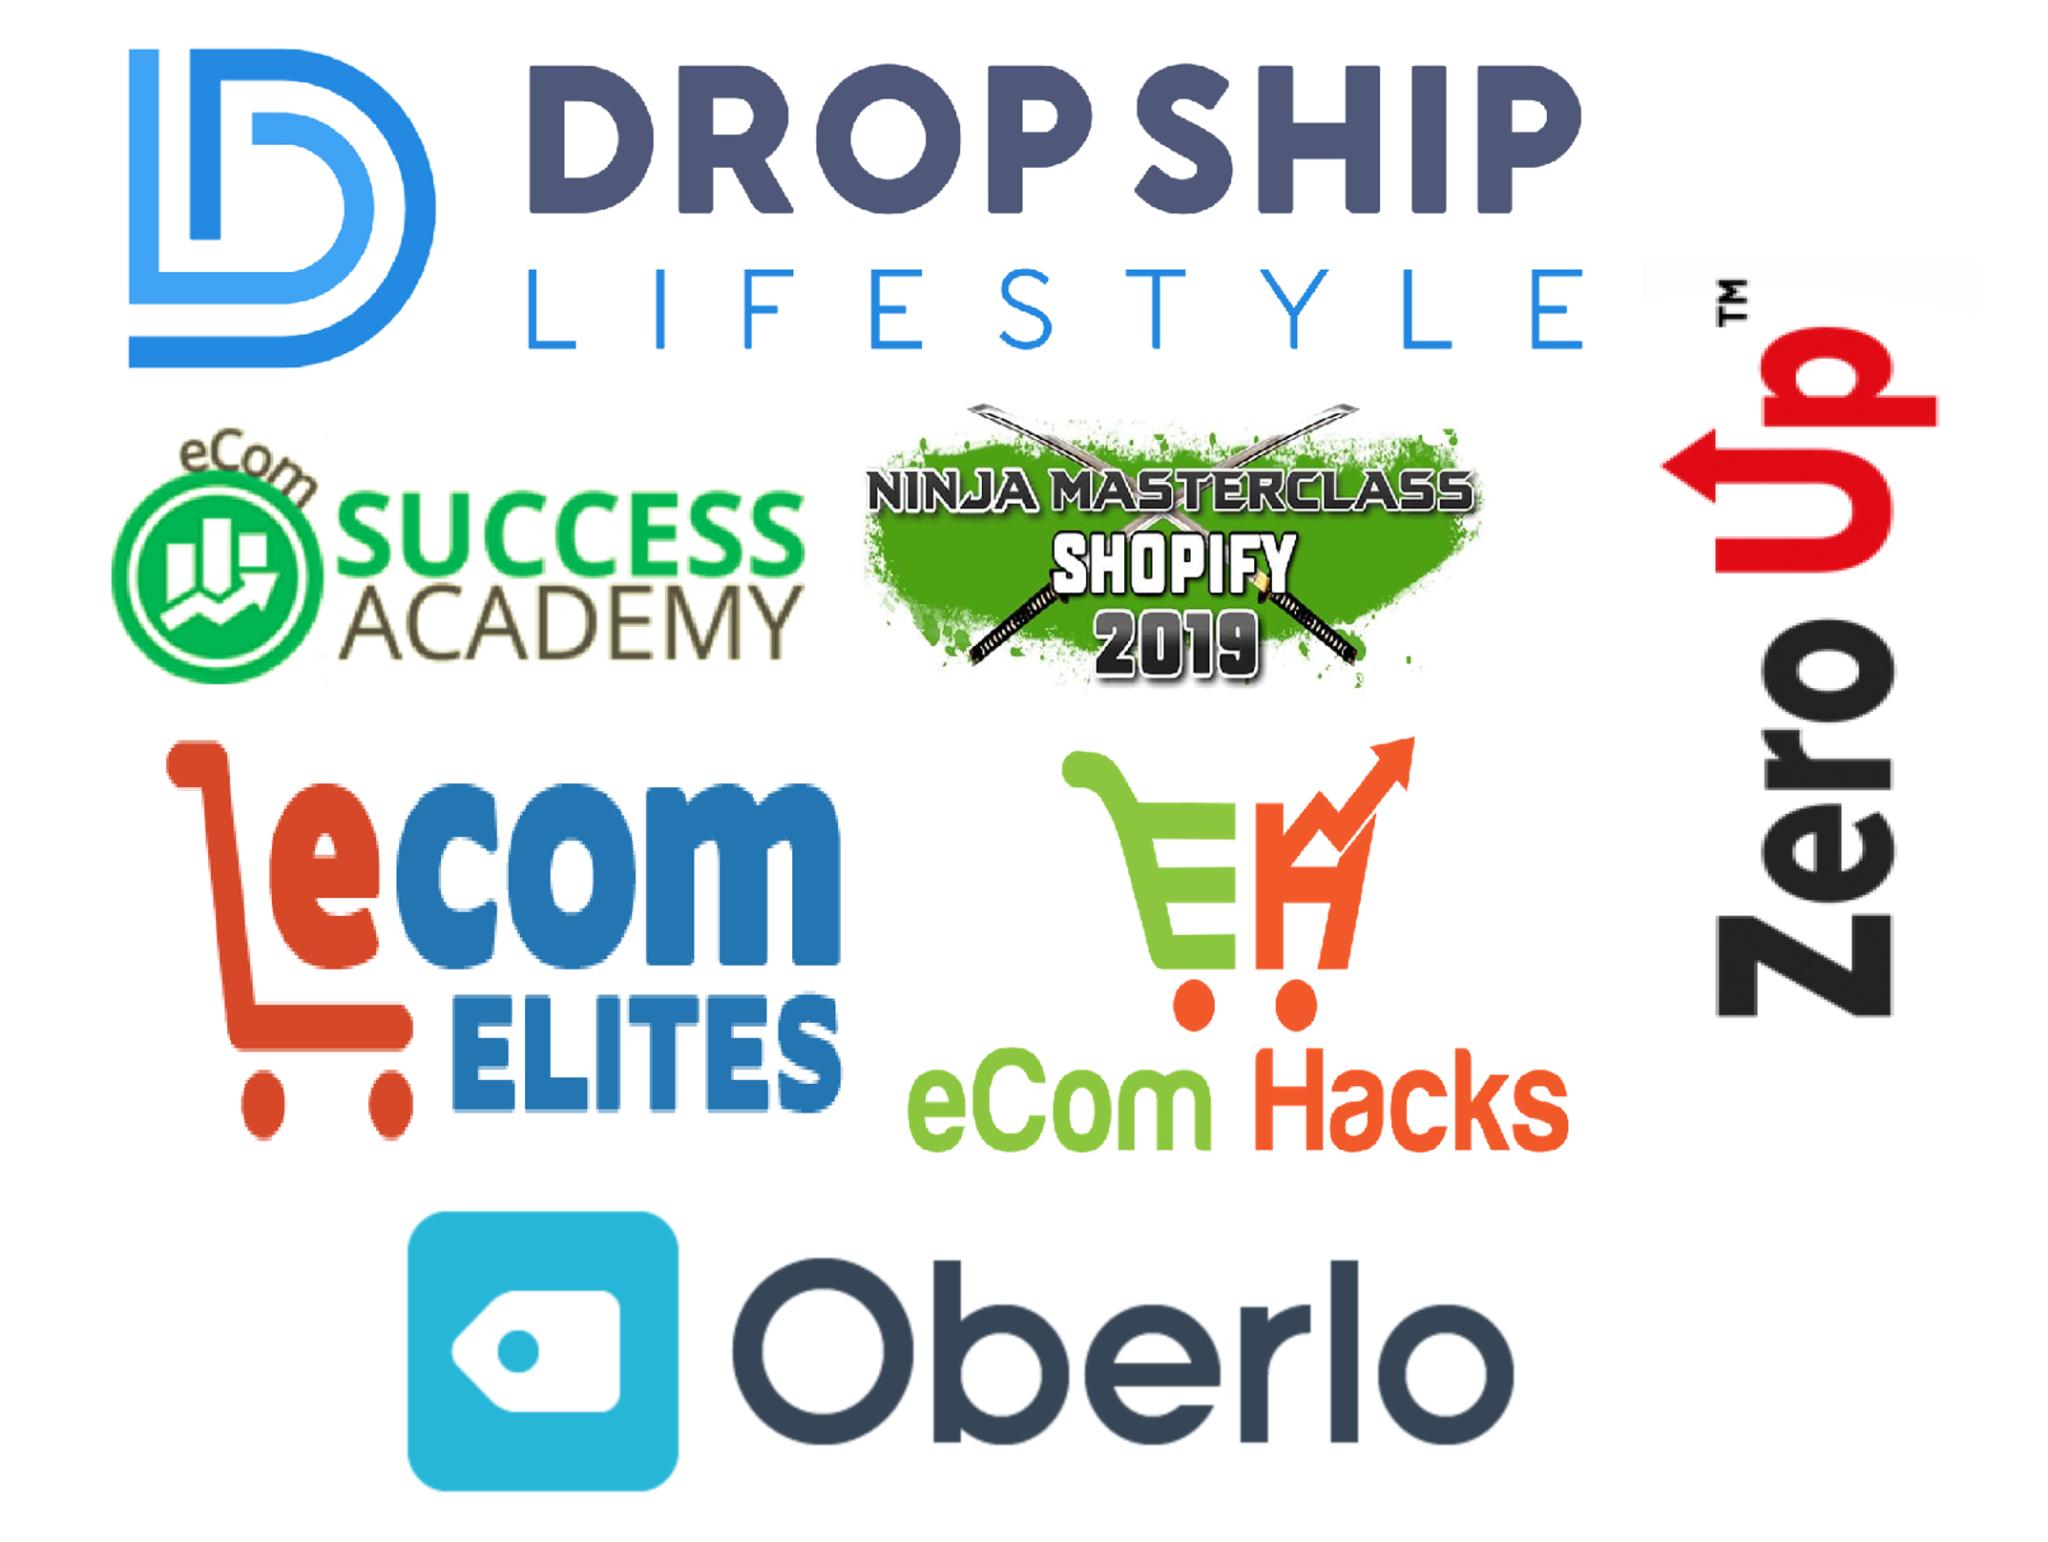 Ippei's Best Dropshipping Courses for 2019 Reviewed: I cover Drop Ship Lifestyle, eCom Success Academy, eCom Elites, Ninja Shopify  Masterclass, eCom Hacks, Oberlo 101 and Zero Up.